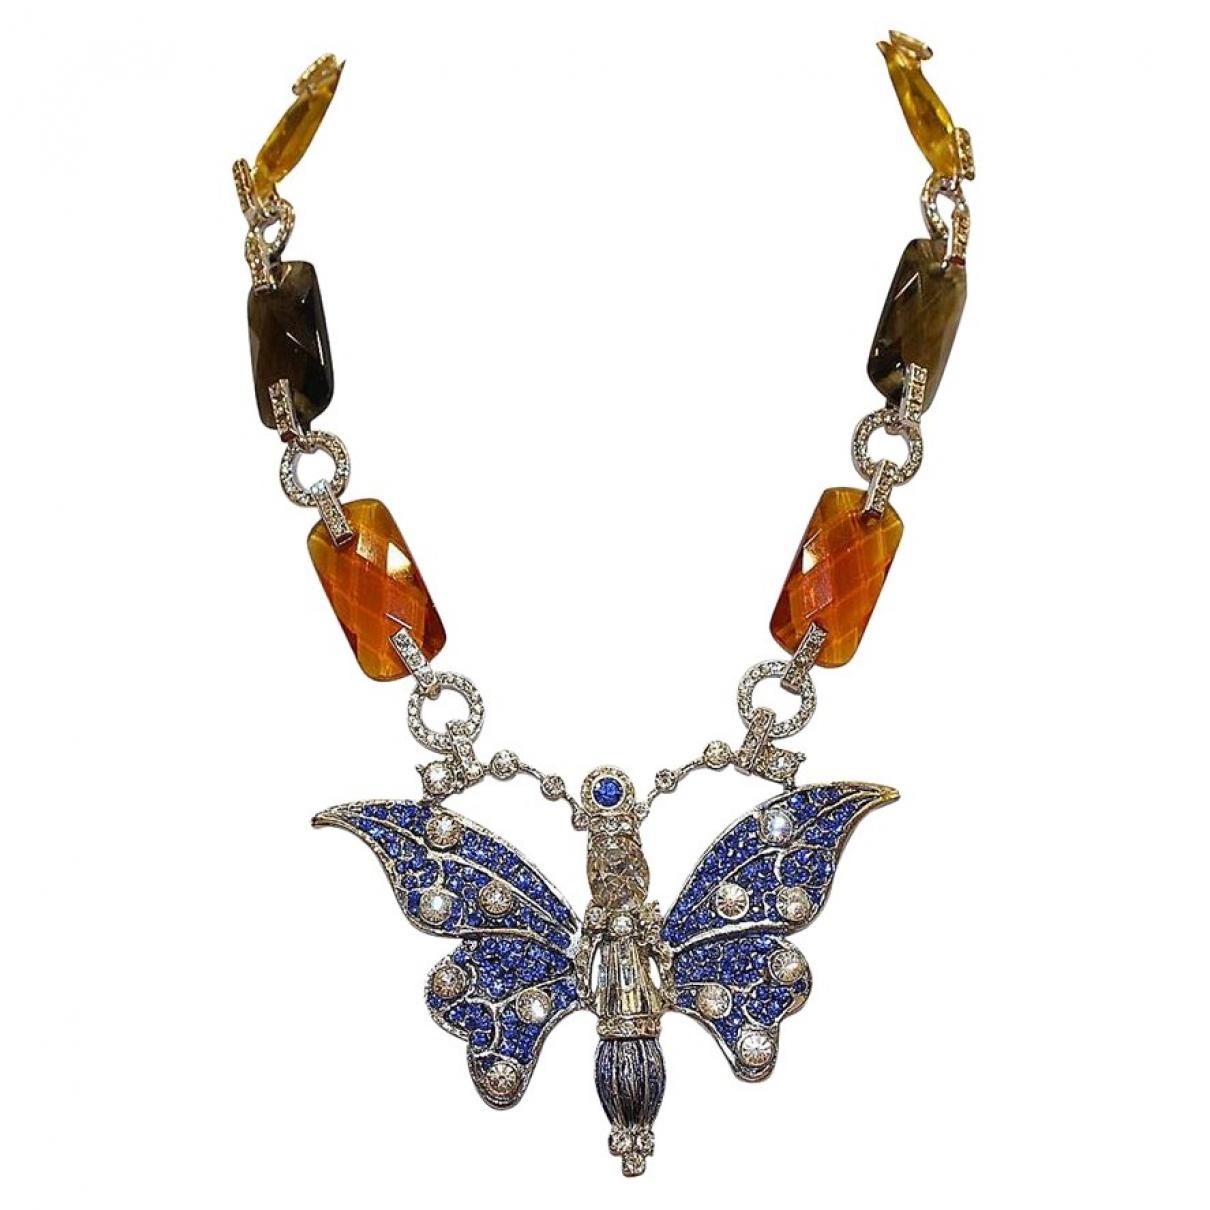 Carlo Zini \N Metallic Metal necklace for Women \N